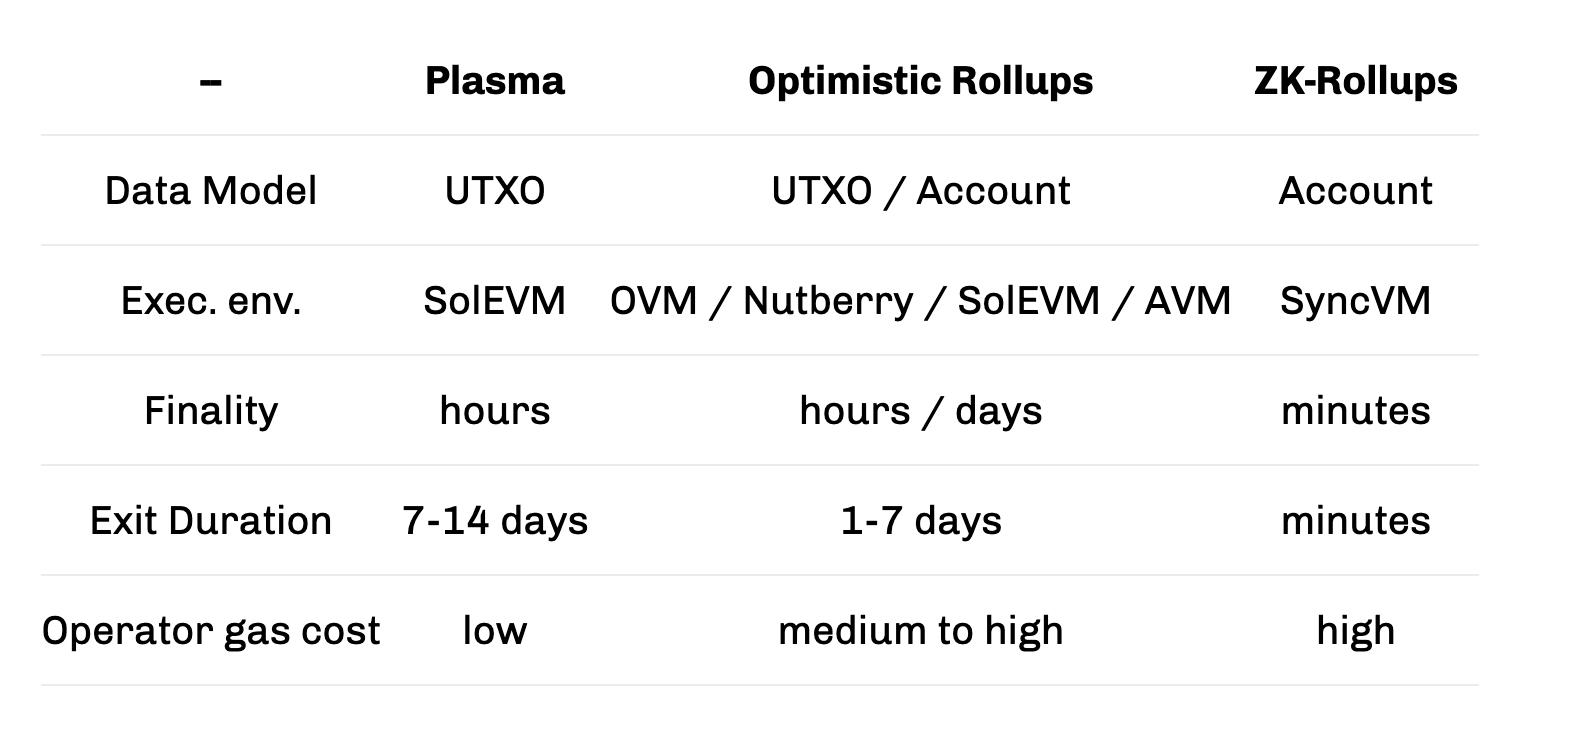 Optimistic Rollups